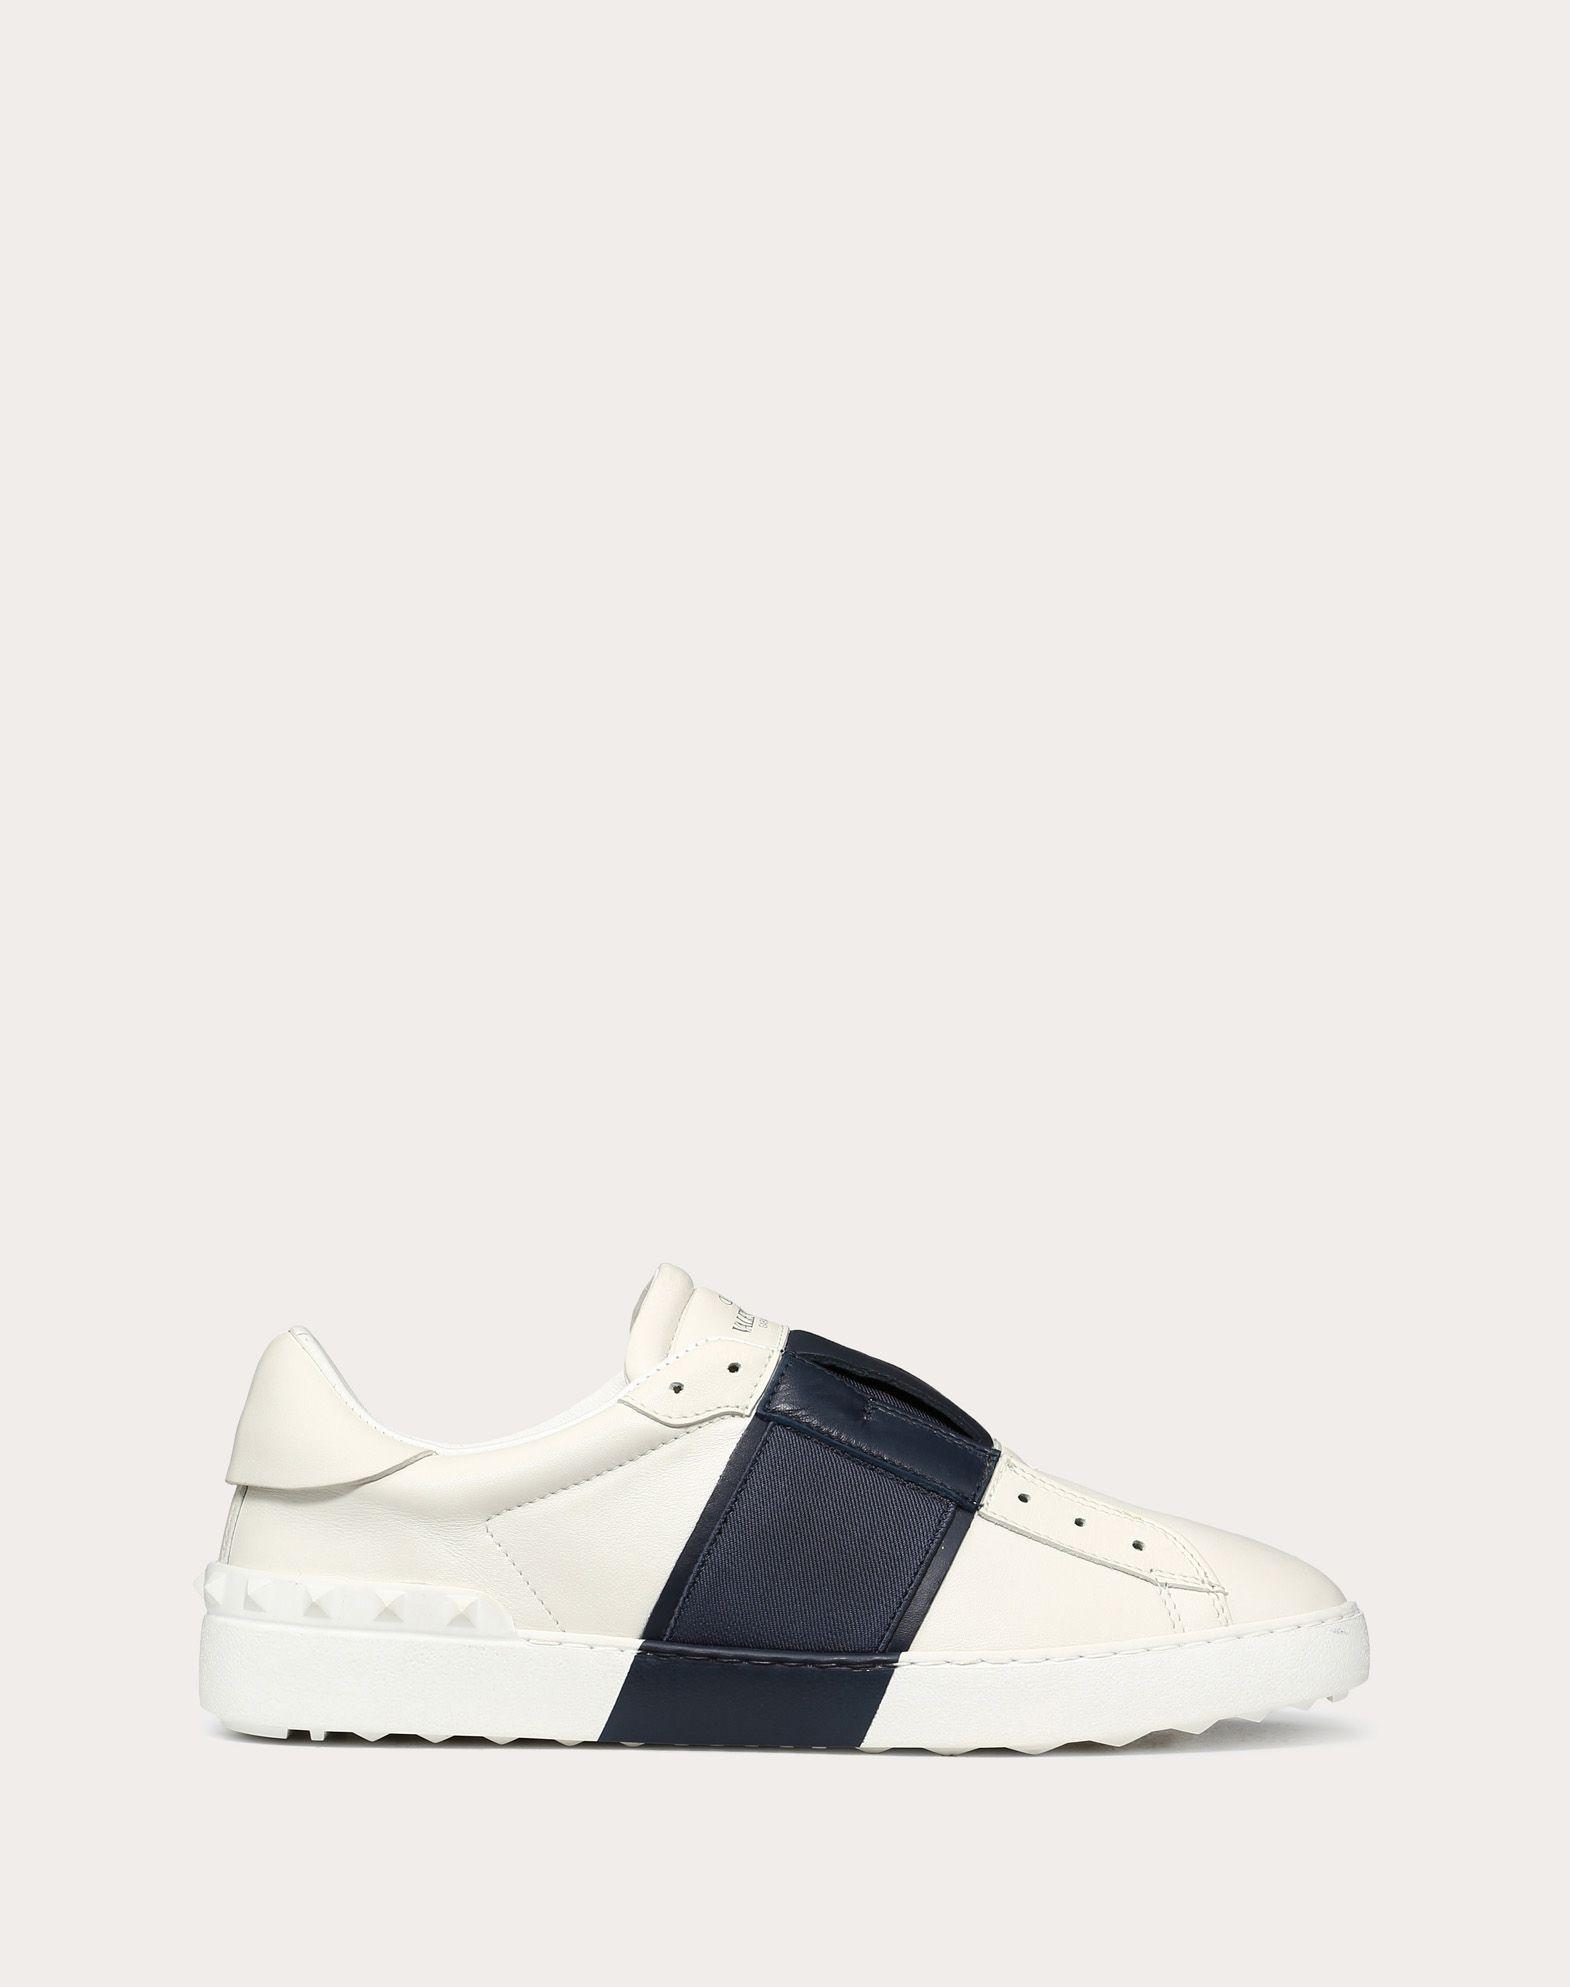 VALENTINO GARAVANI UOMO Elastic Sneaker LOW-TOP SNEAKERS U f